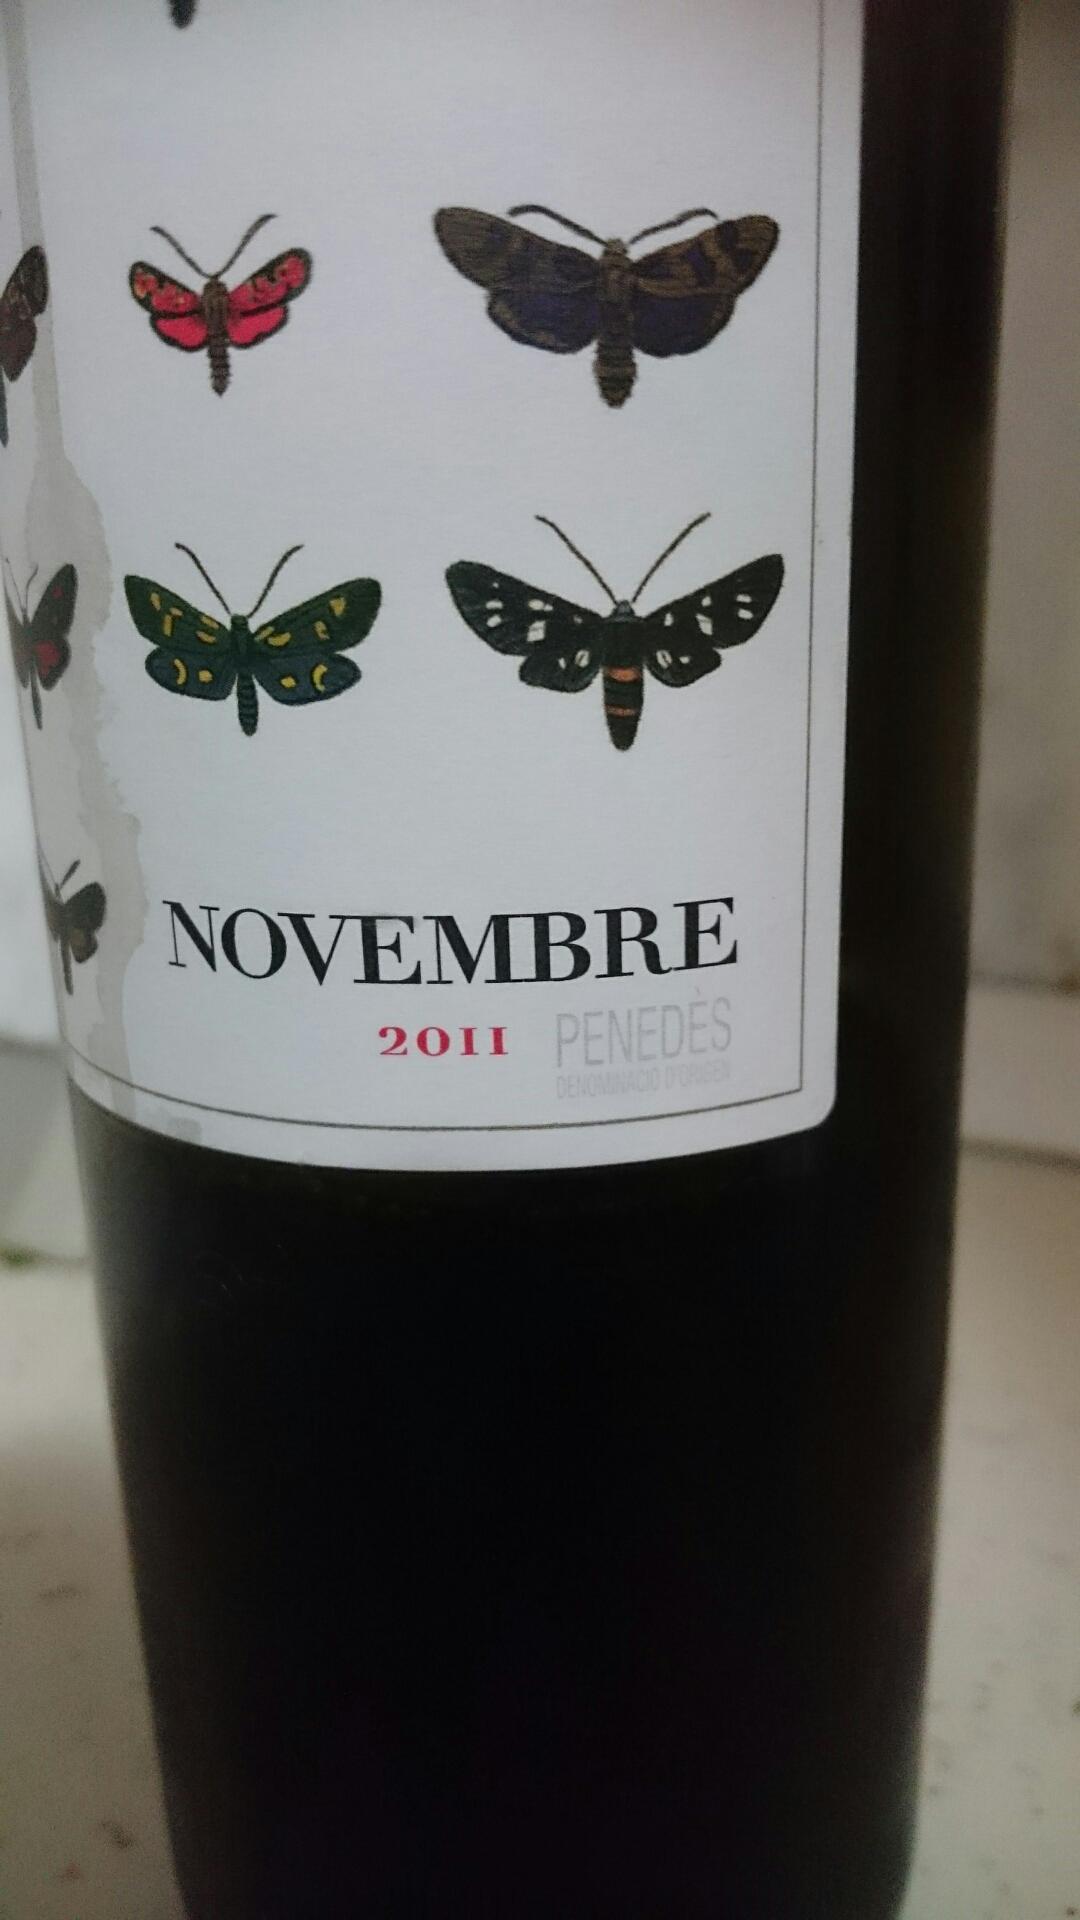 Vin: Novembre